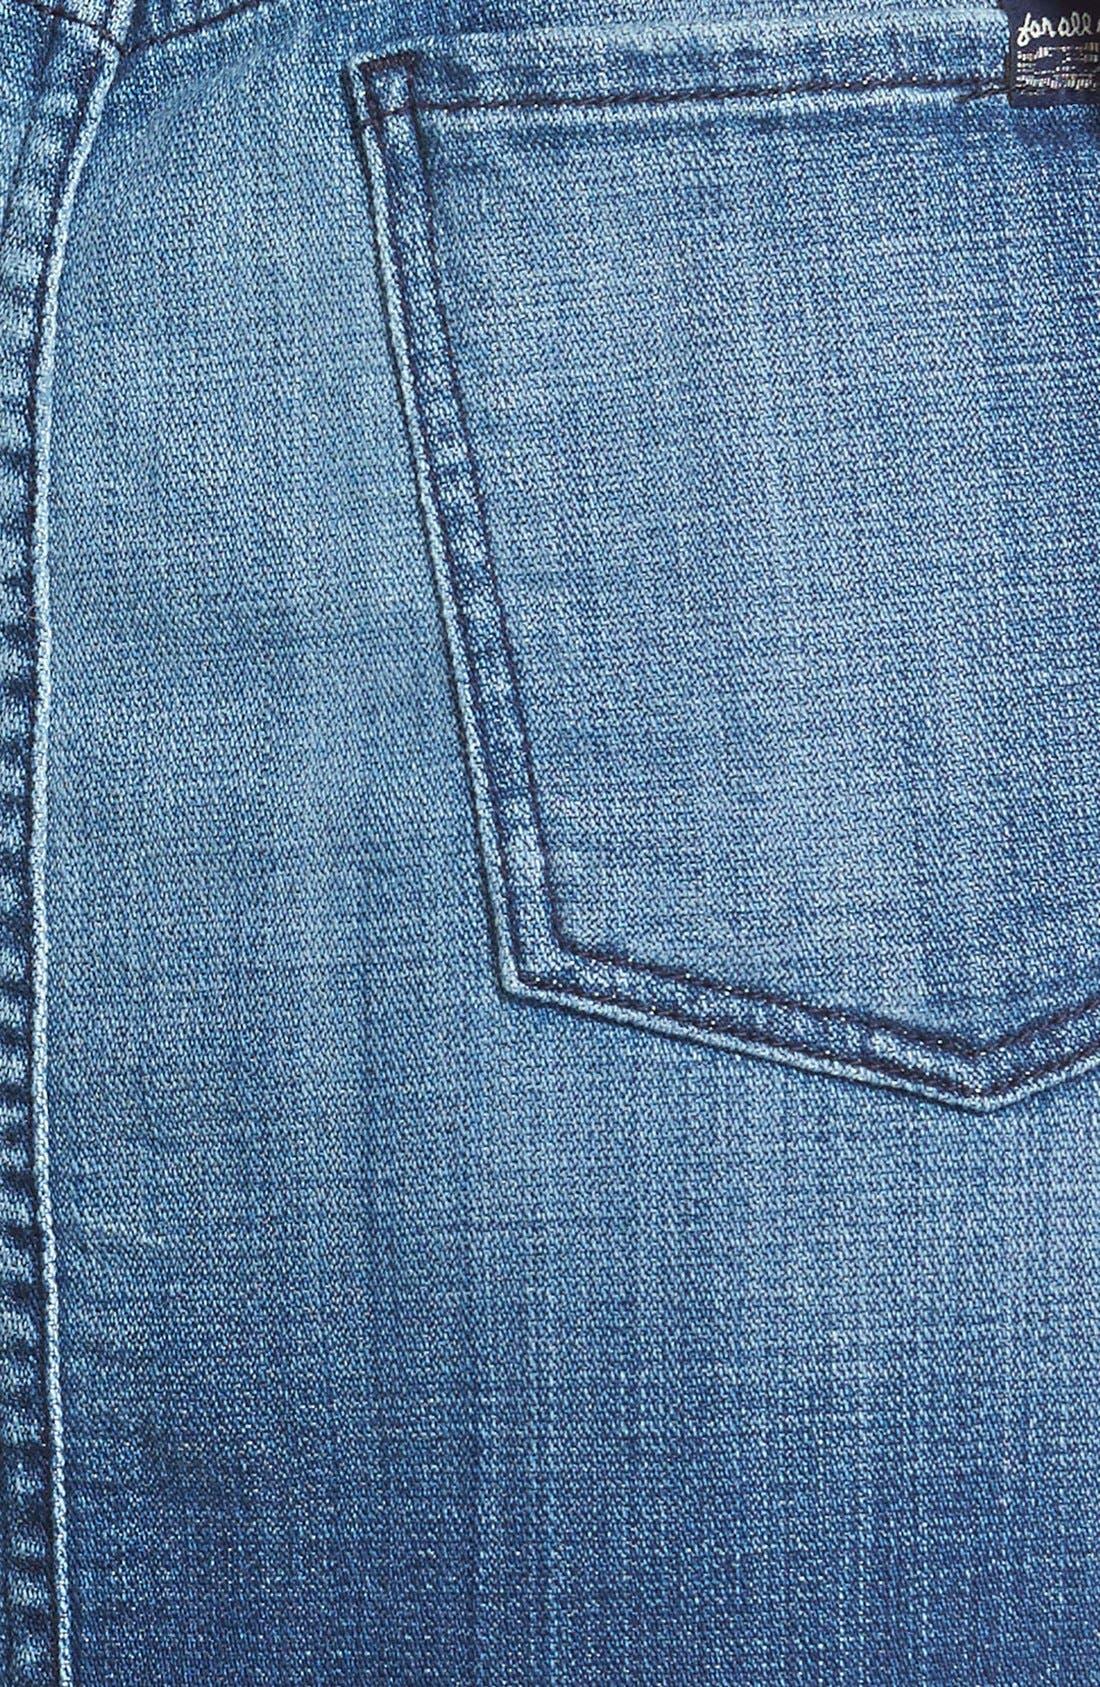 Denim Overall Skirt,                             Alternate thumbnail 3, color,                             Medium Broken Twill